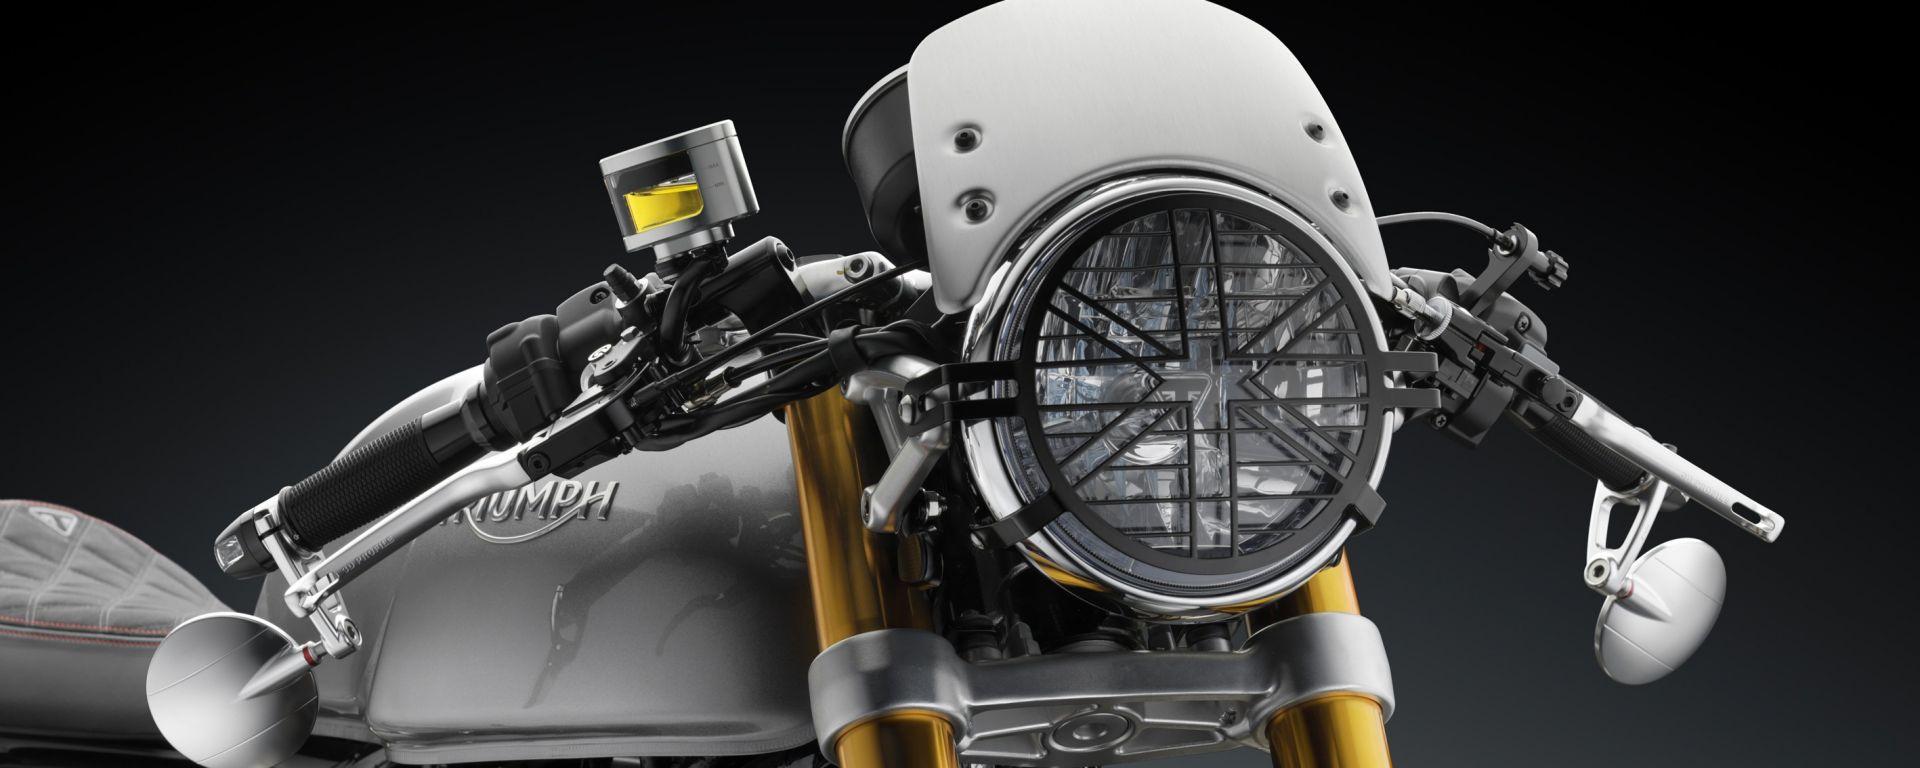 Triumph ThruxtonR by Rizoma